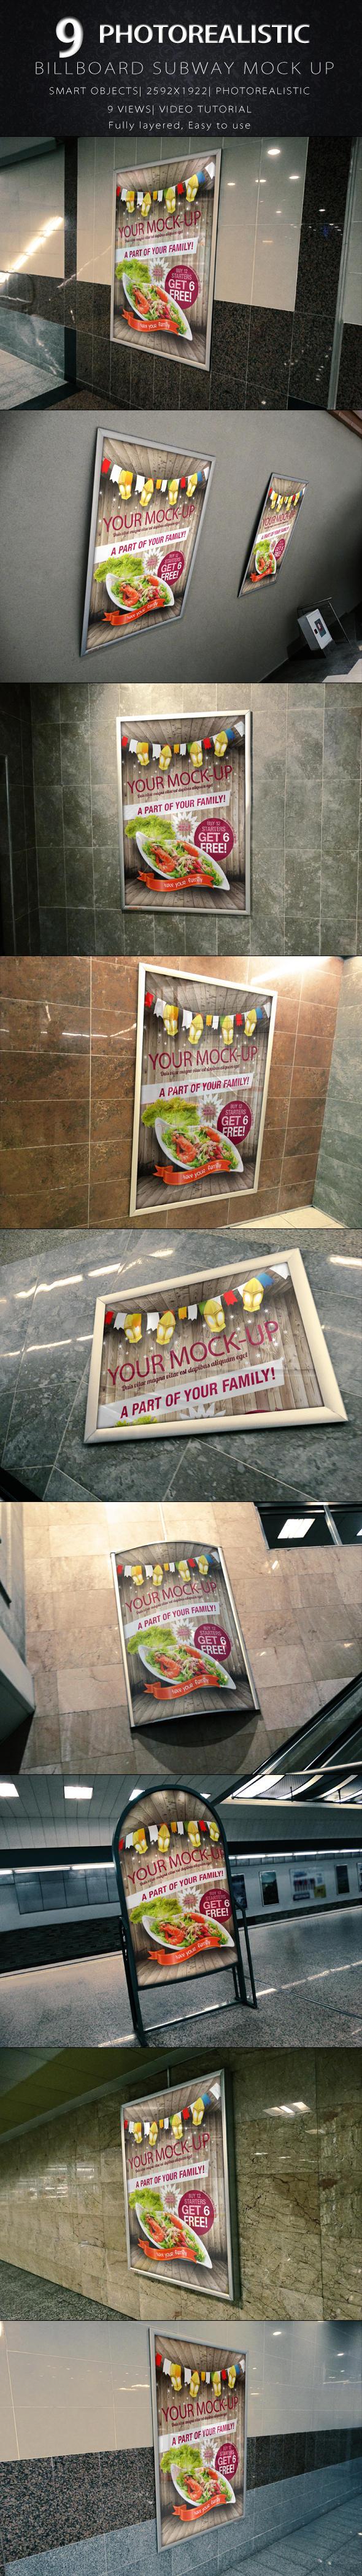 Photorealistic Billboard Subway Mock-Up by KILVAM